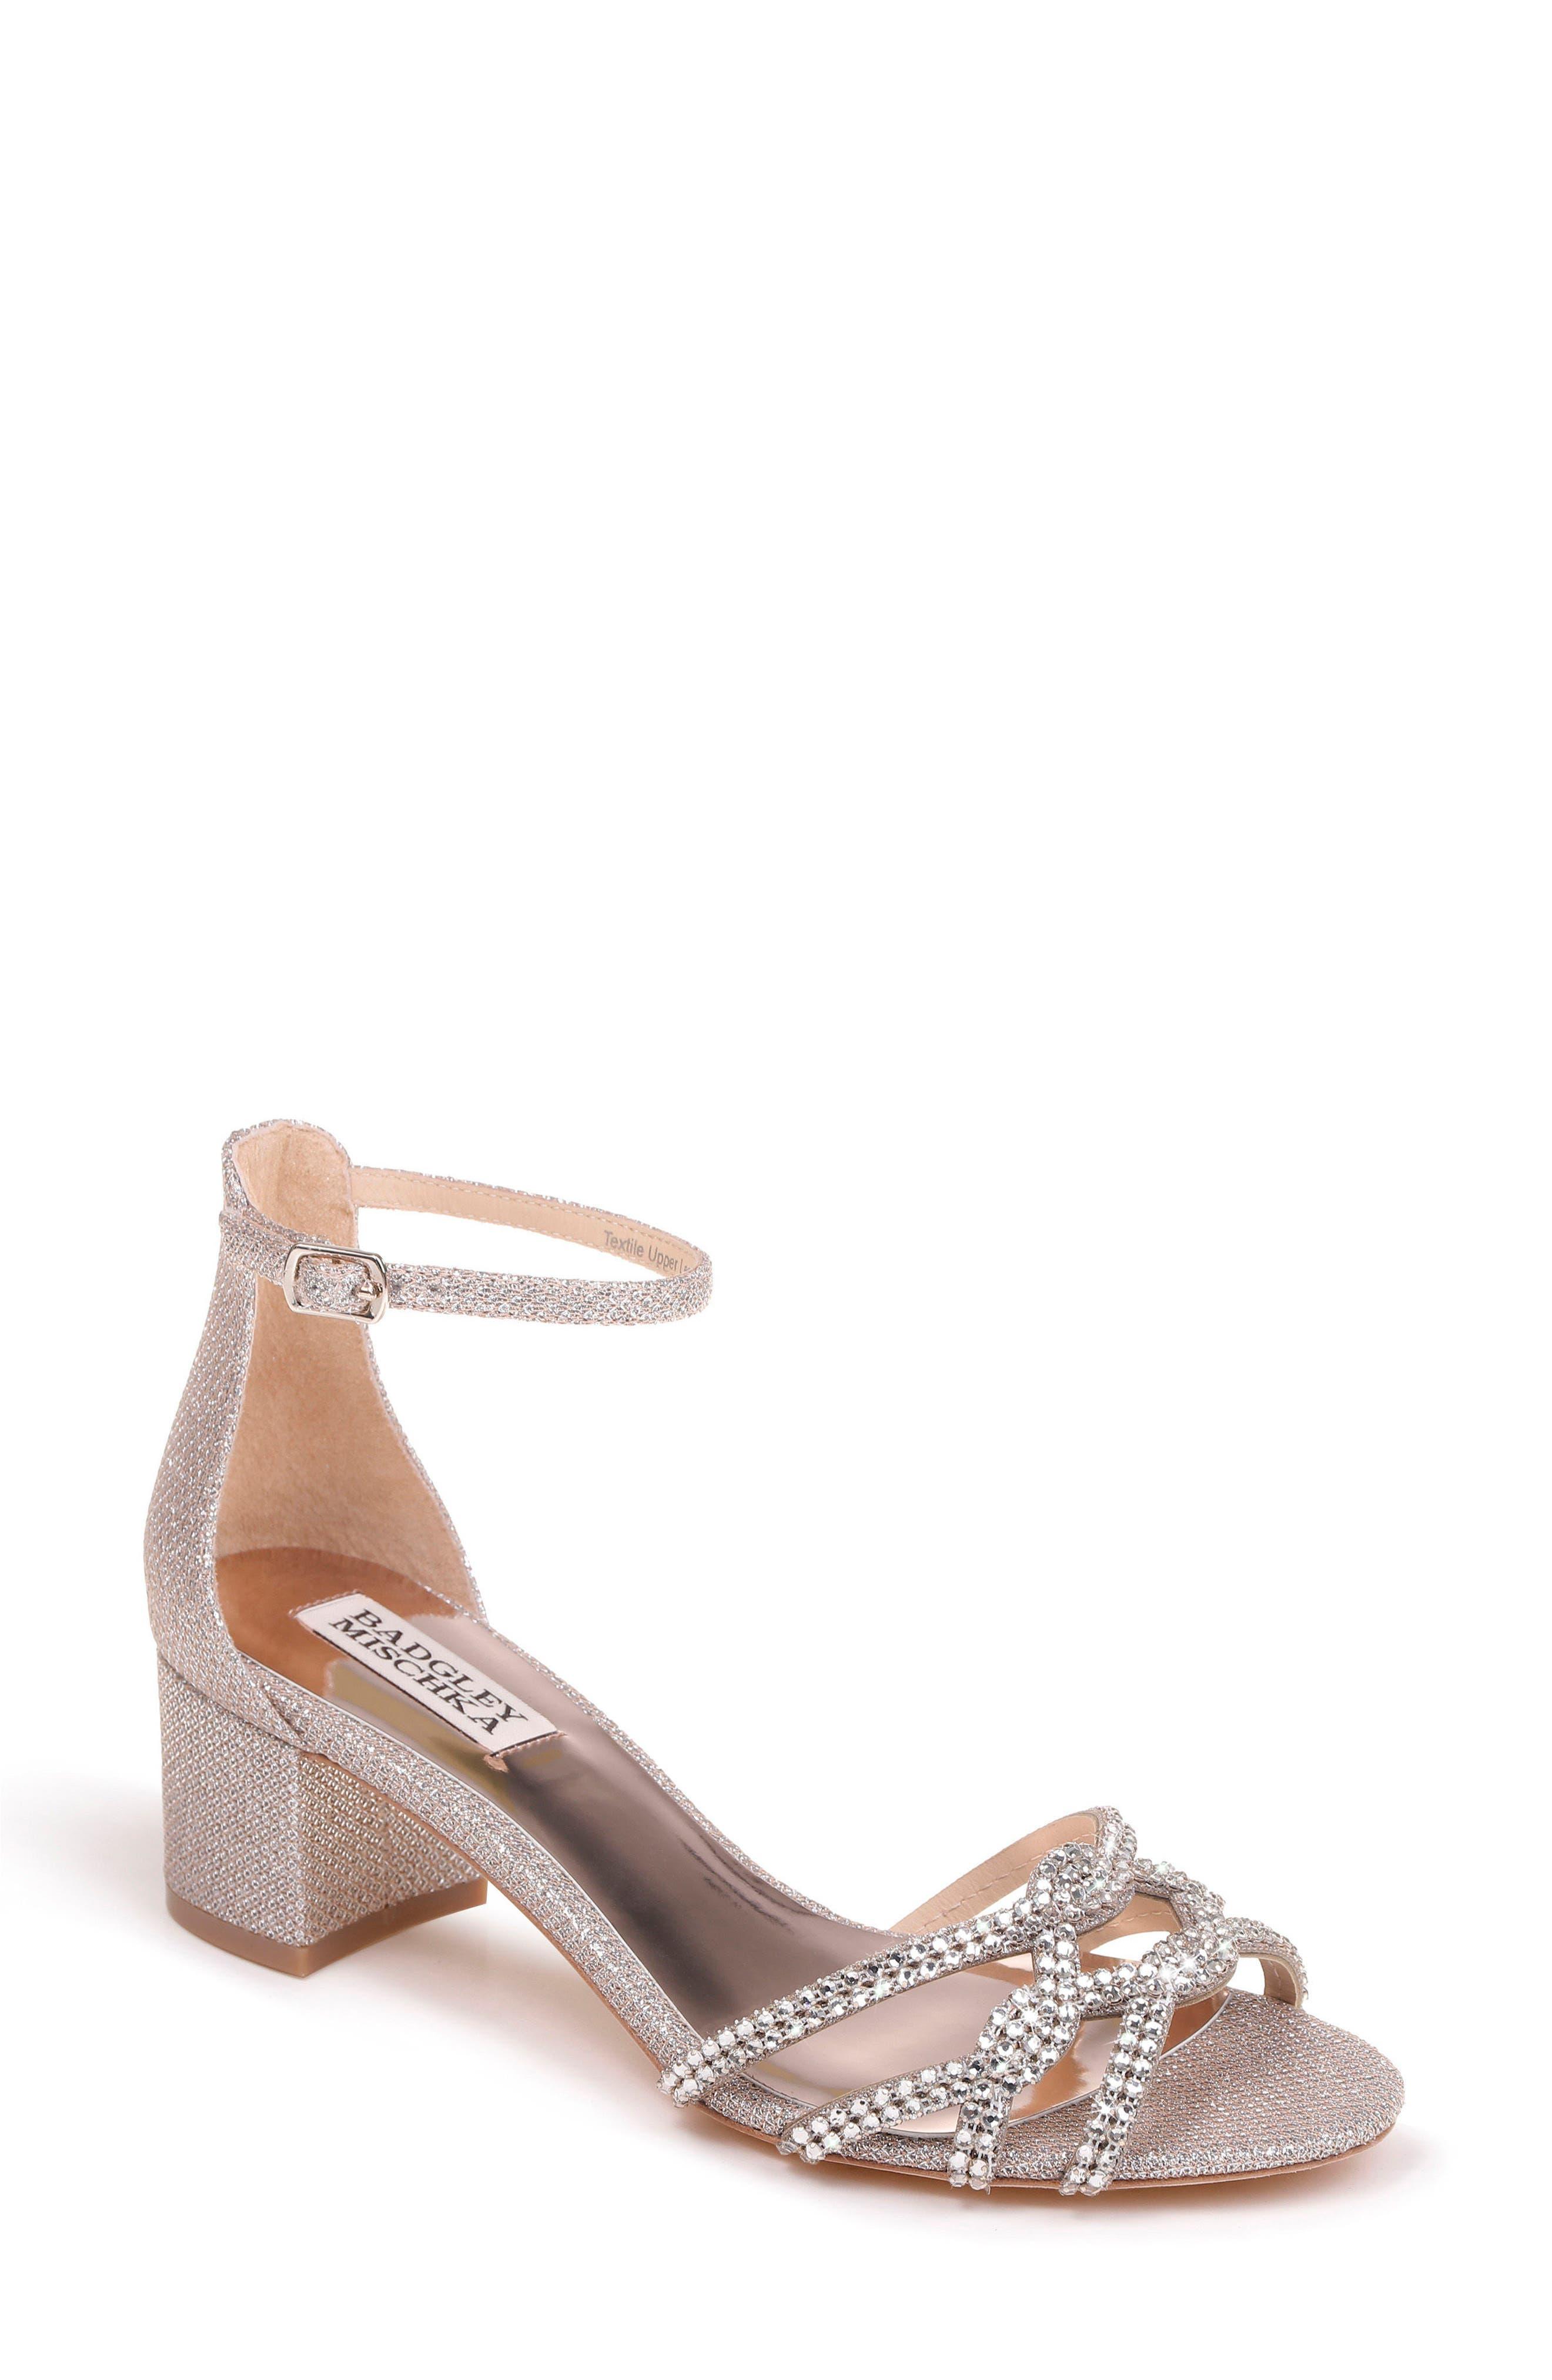 Main Image - Badgley Mischka Sonya Block Heel Sandal (Women)